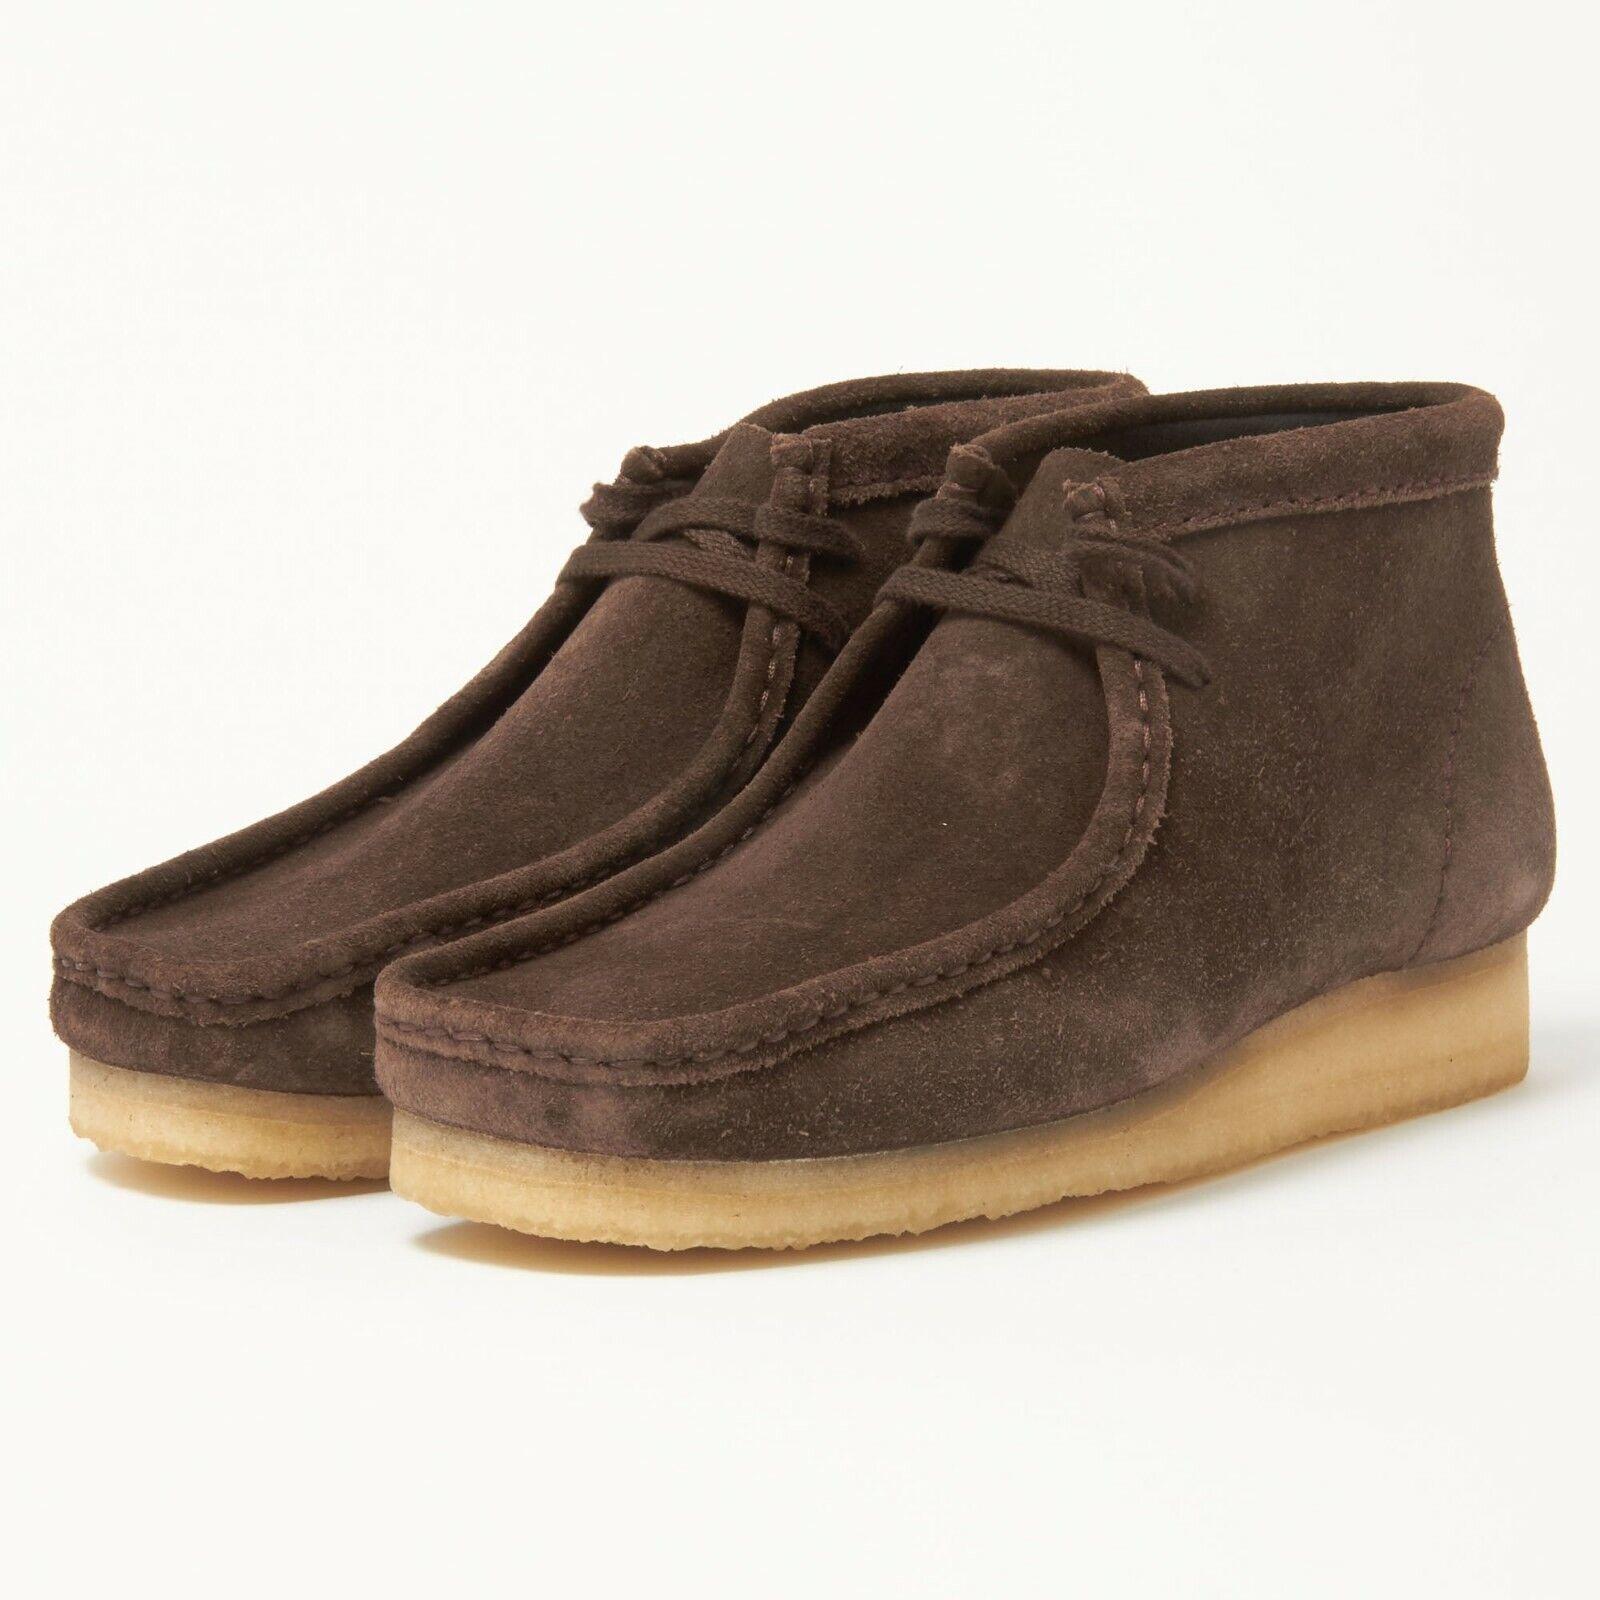 Clarks Originals Wallabee Boot Men's Nut Brown Suede Casual Shoes 26103658